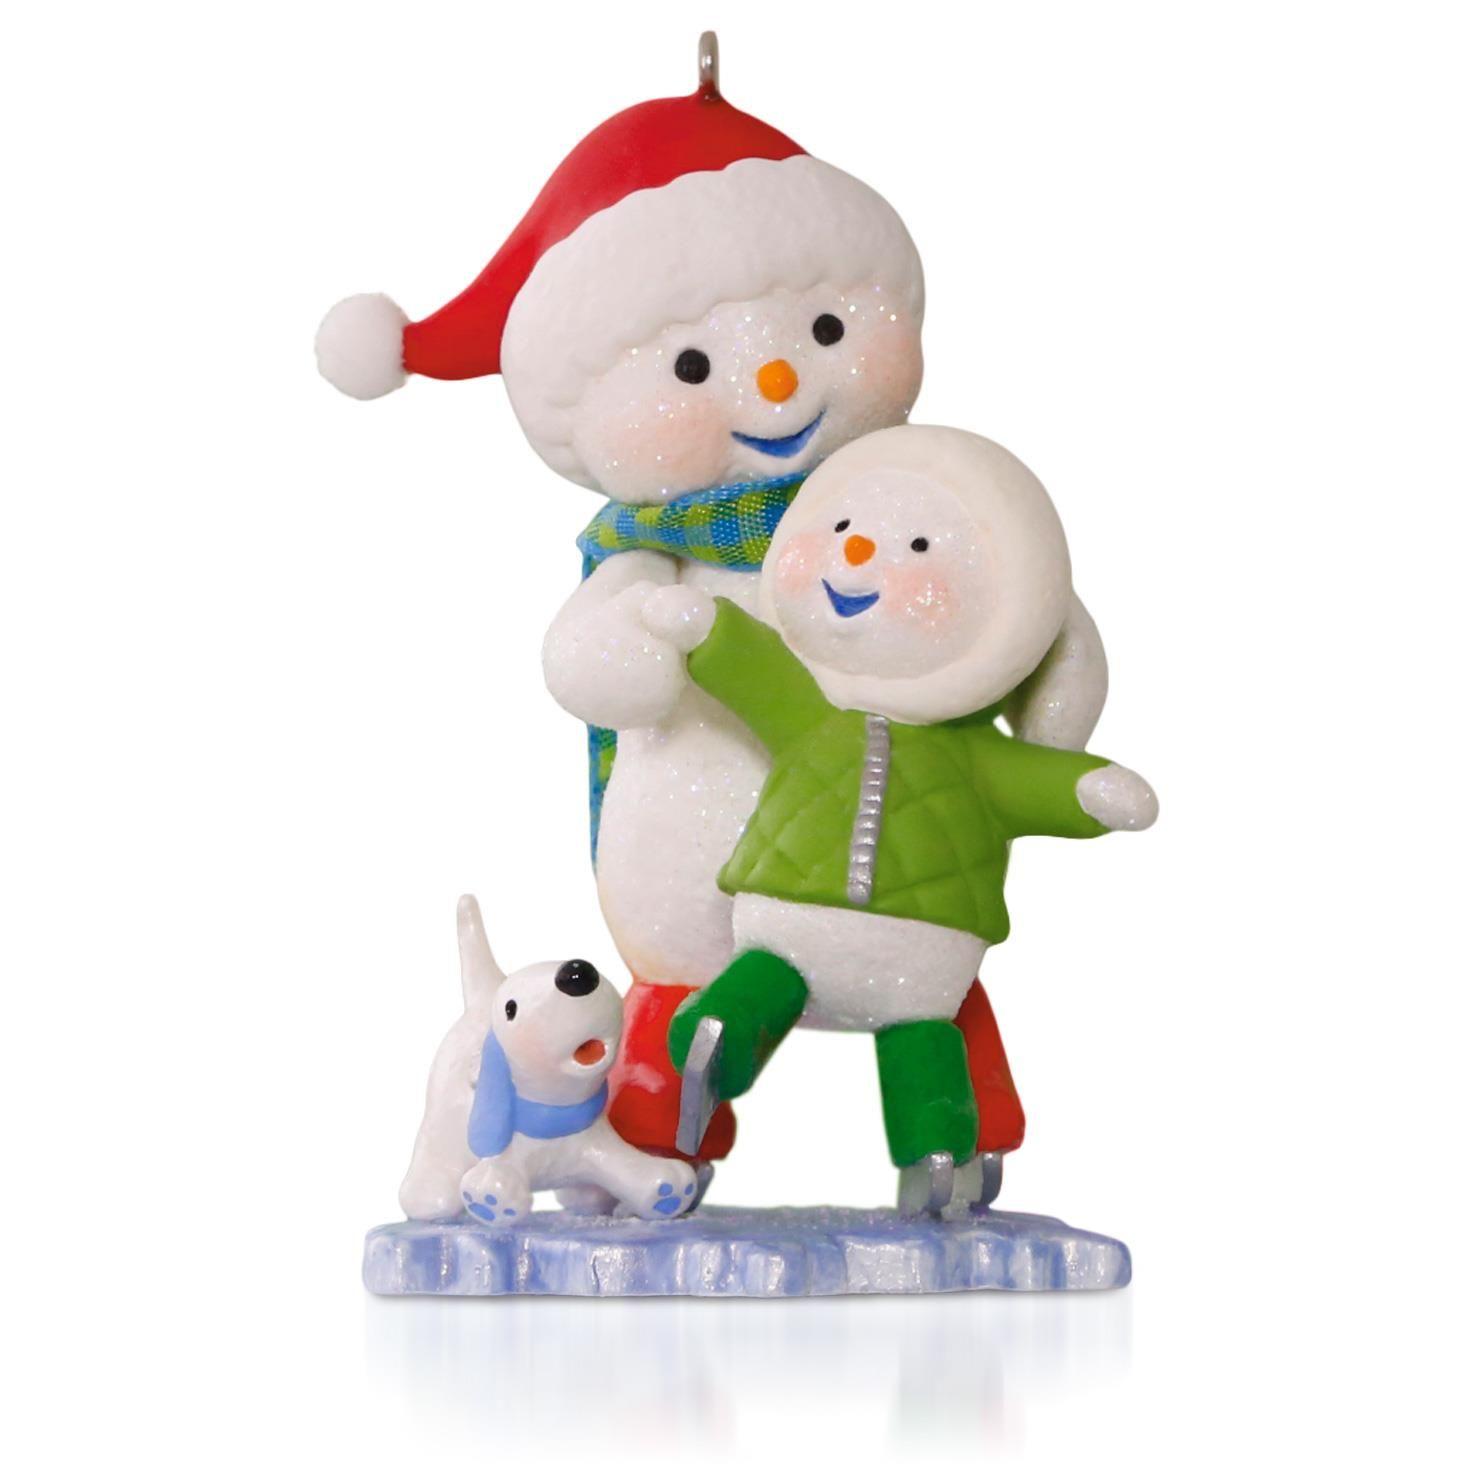 Miniature Christmas Ornaments